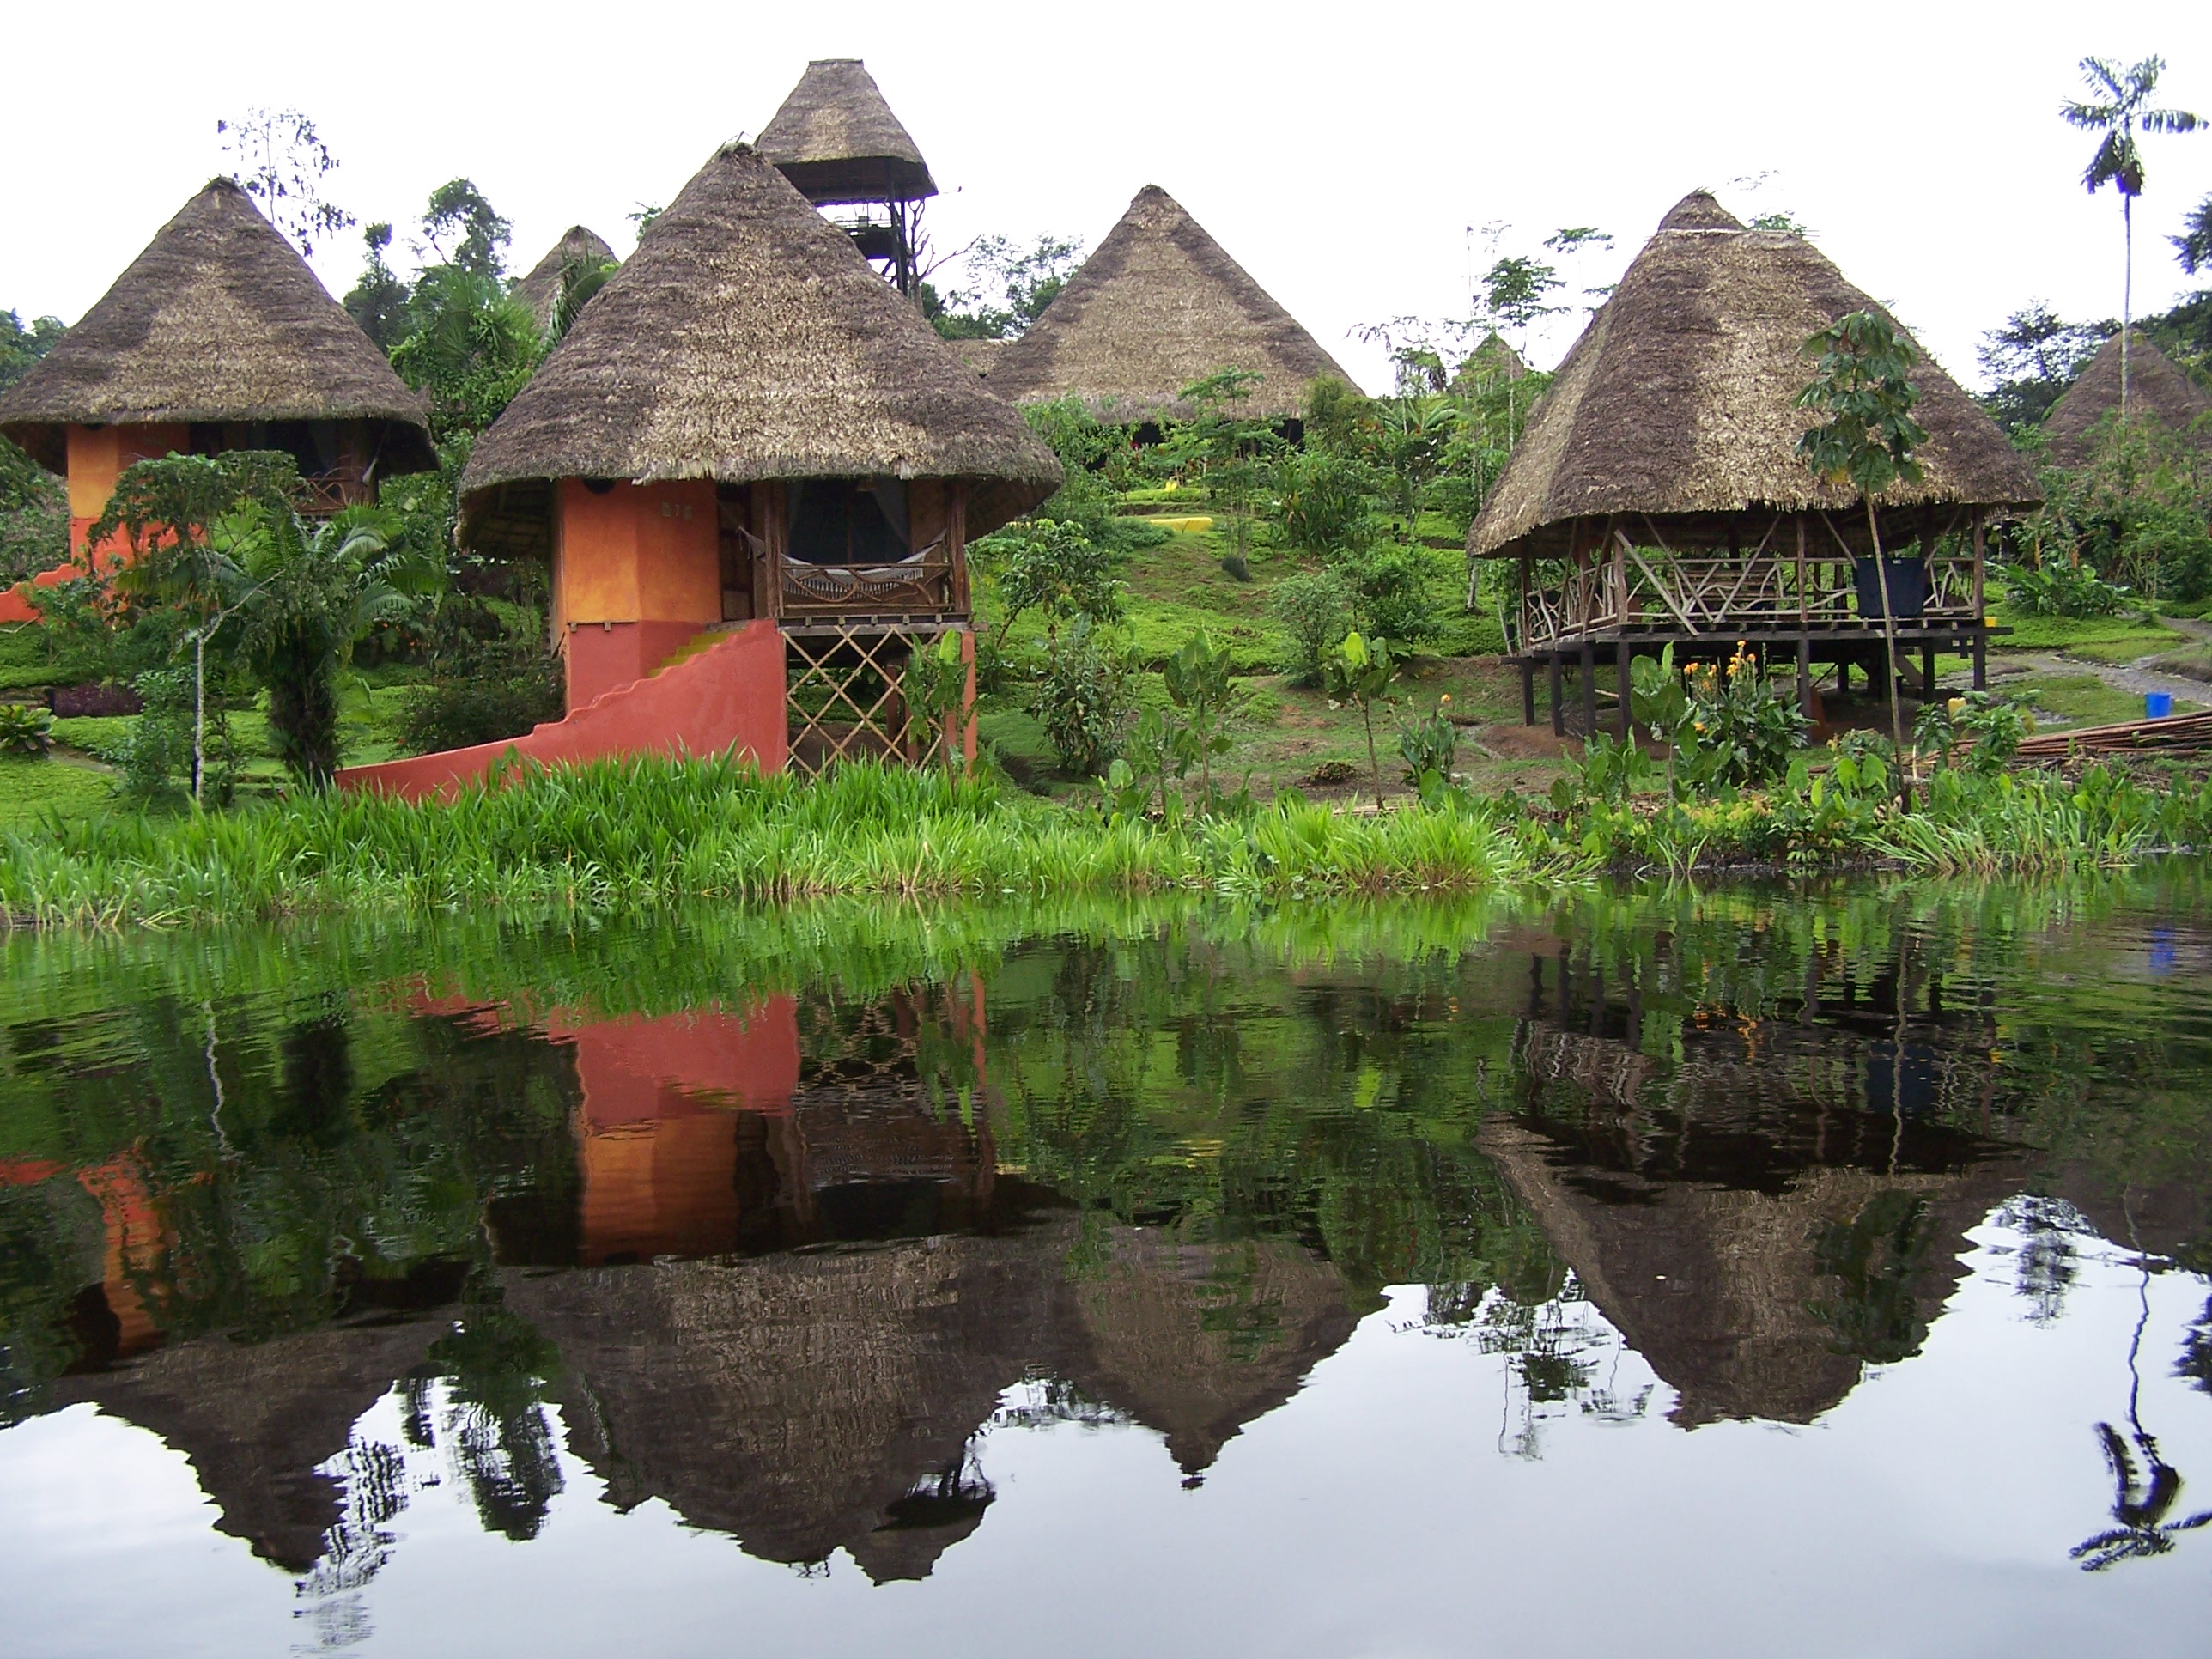 spectacular-experience-in-the-amazon-jungle-in-ecuador